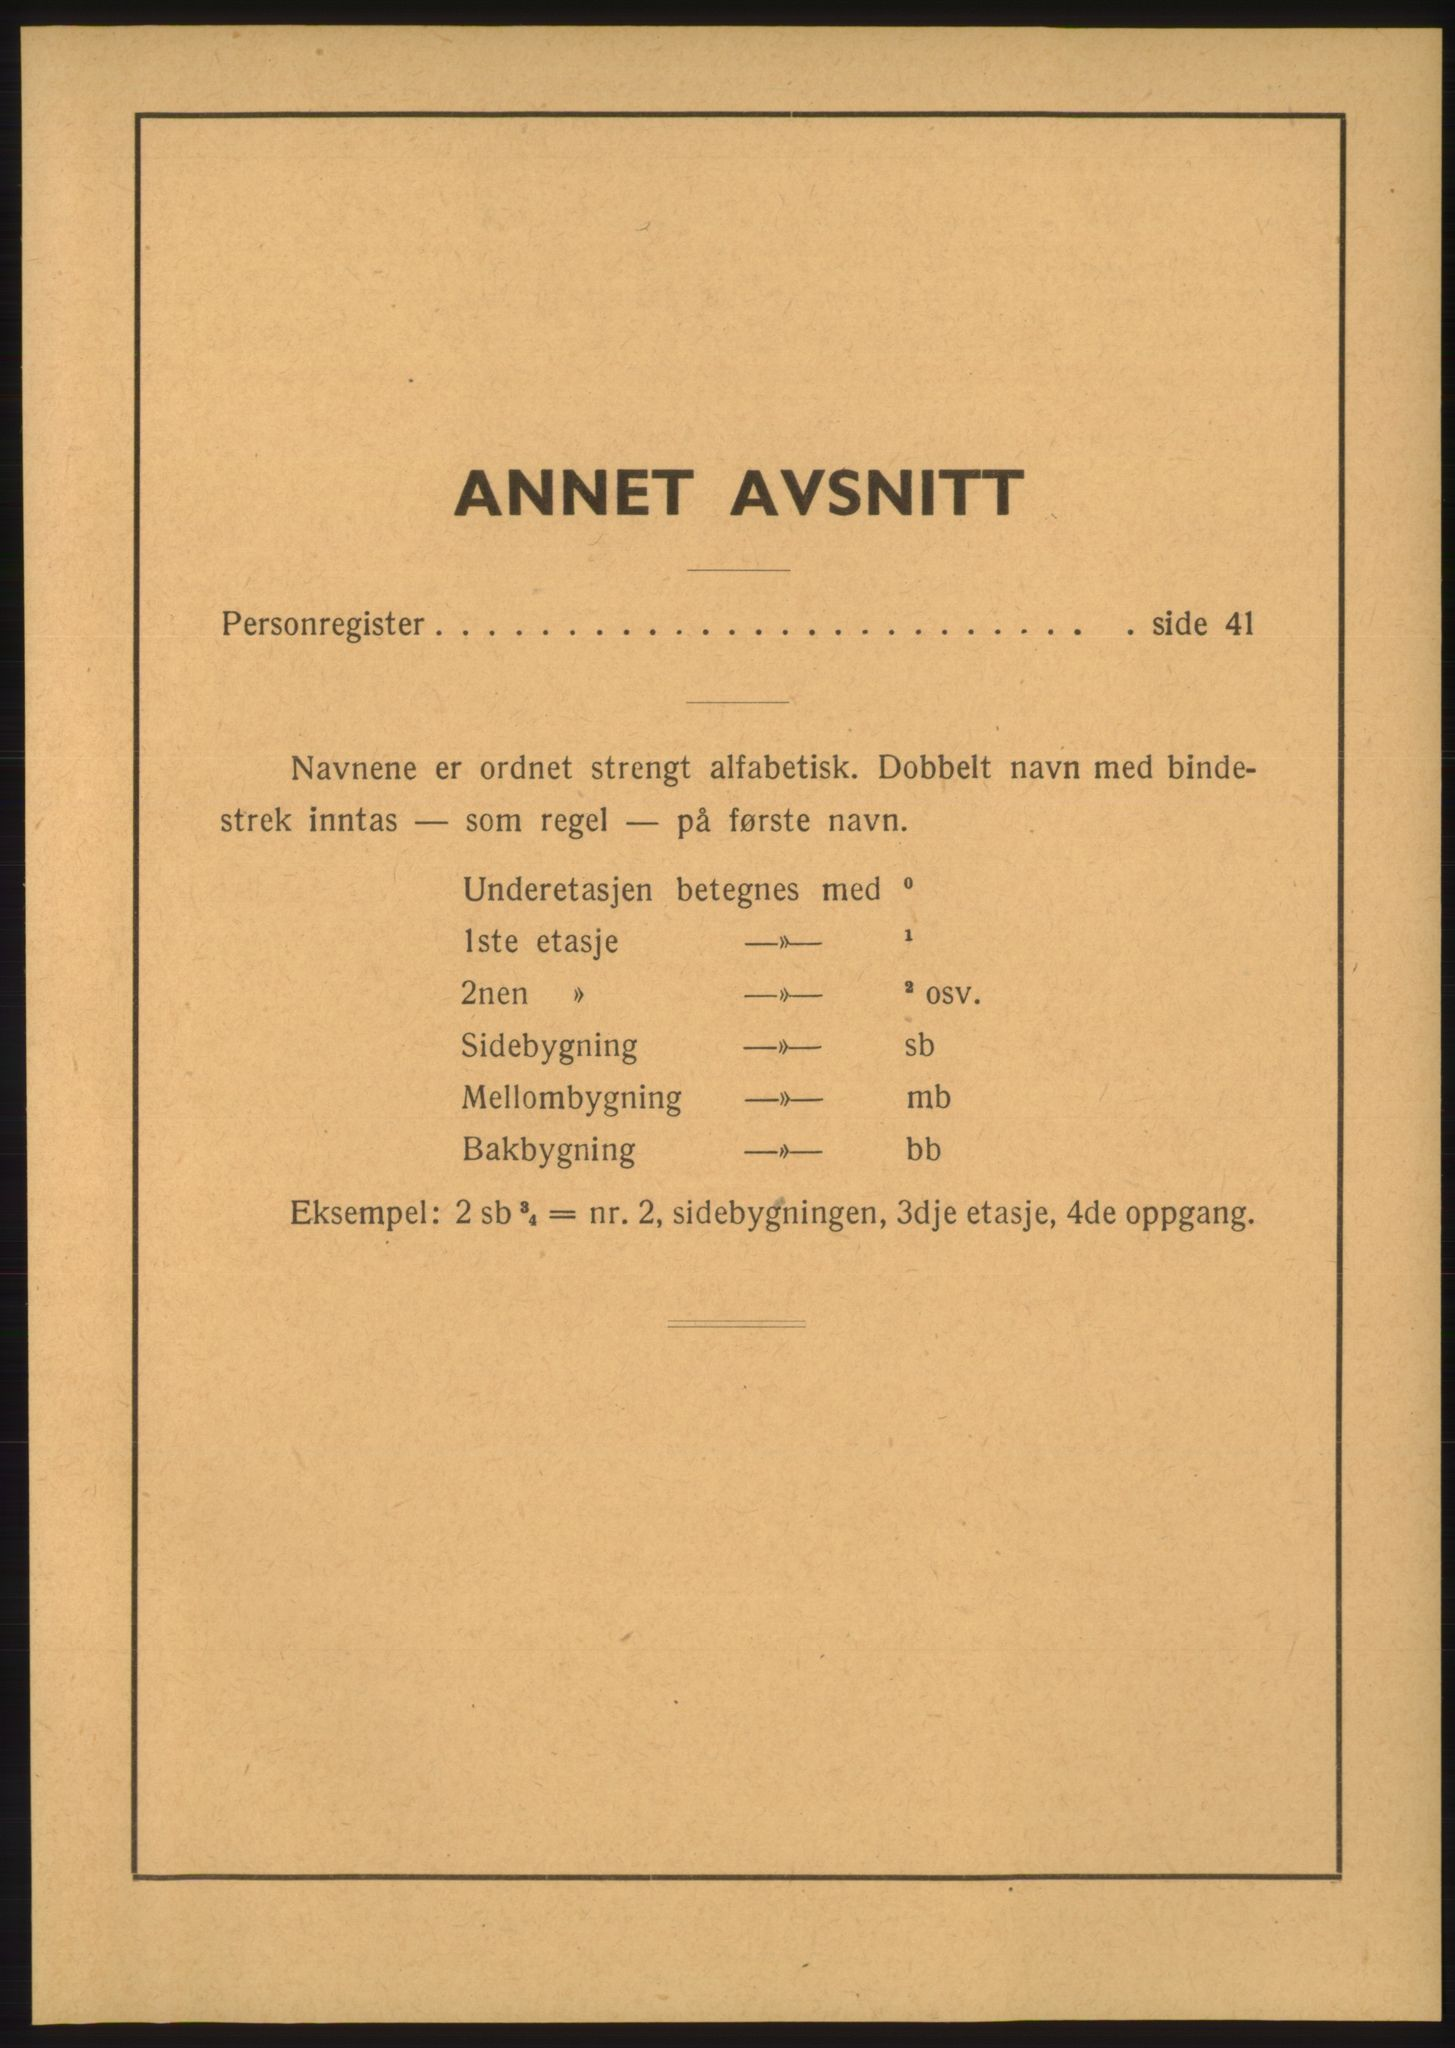 RA, Oslo adressebok (publikasjon)*, 1948, s. upaginert